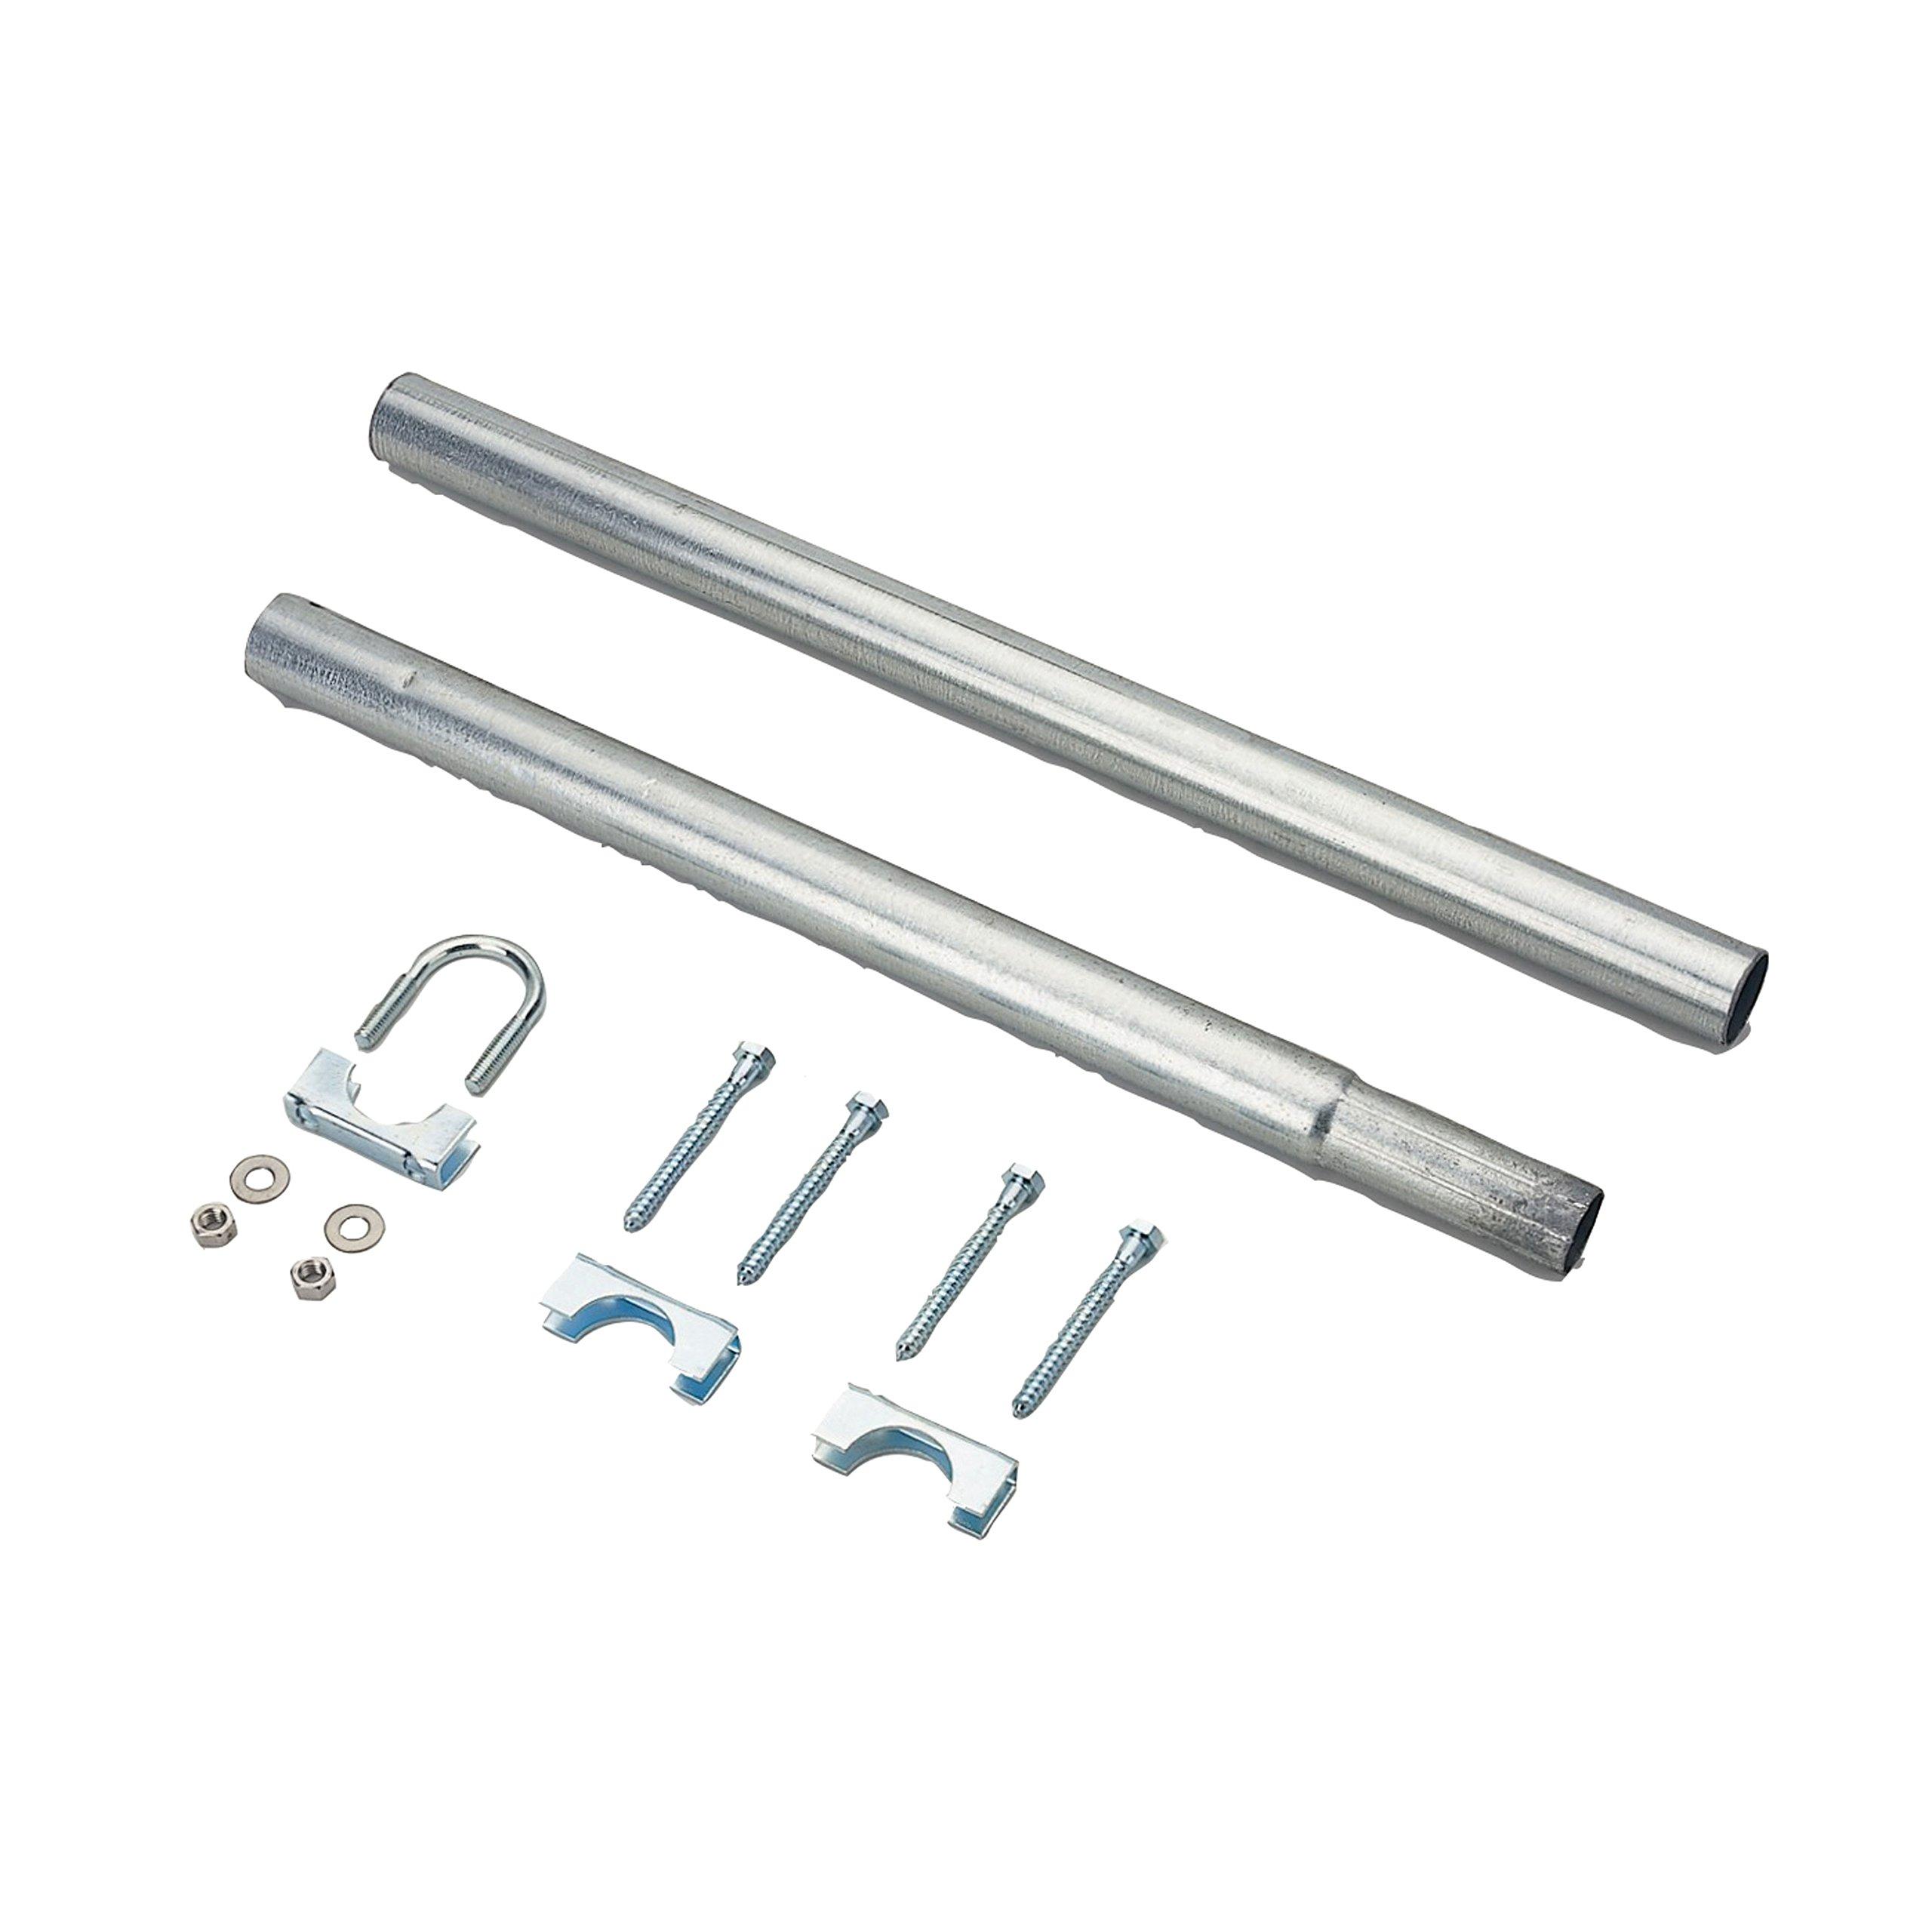 Davis Instruments Mounting Pole Kit